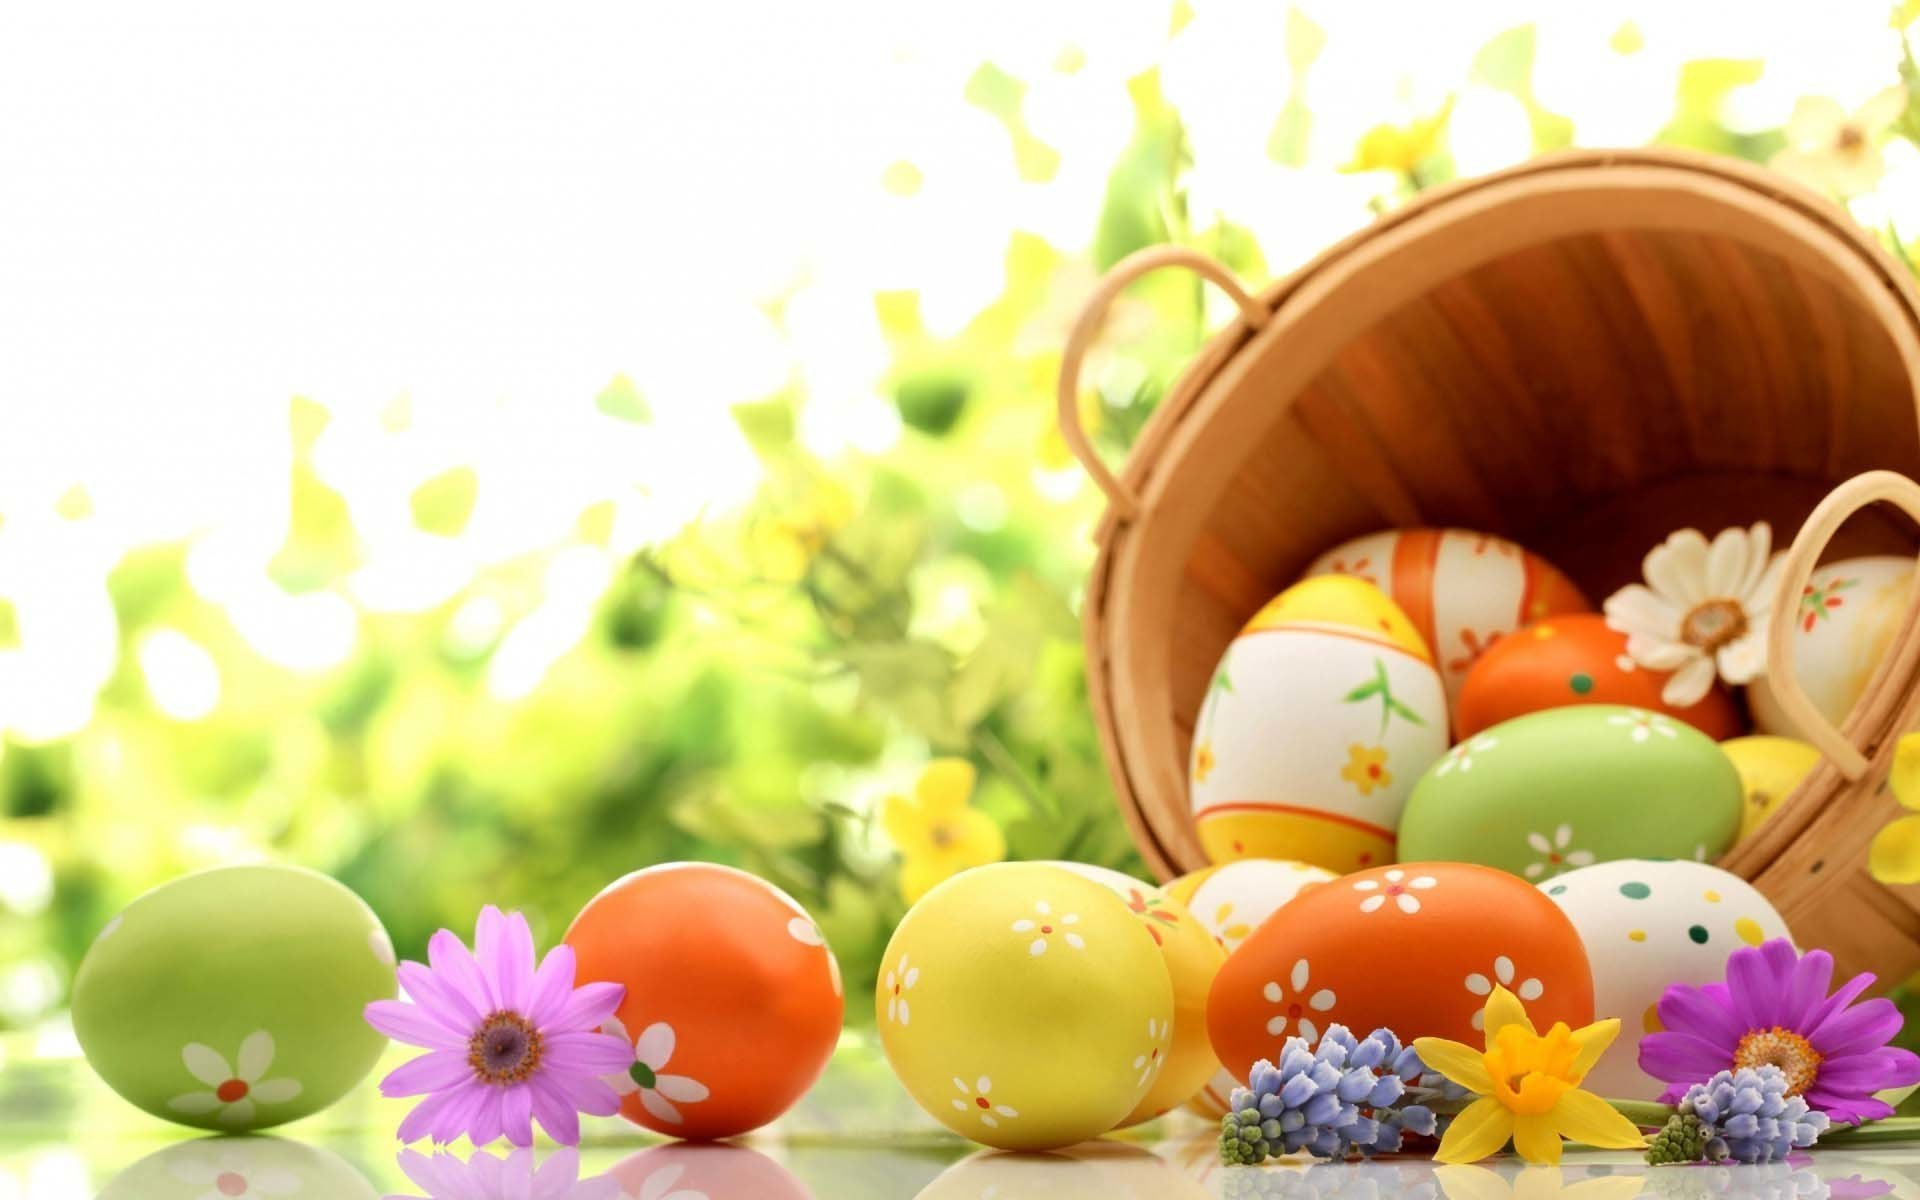 Easter Wallpapers Desktop (71+ images)